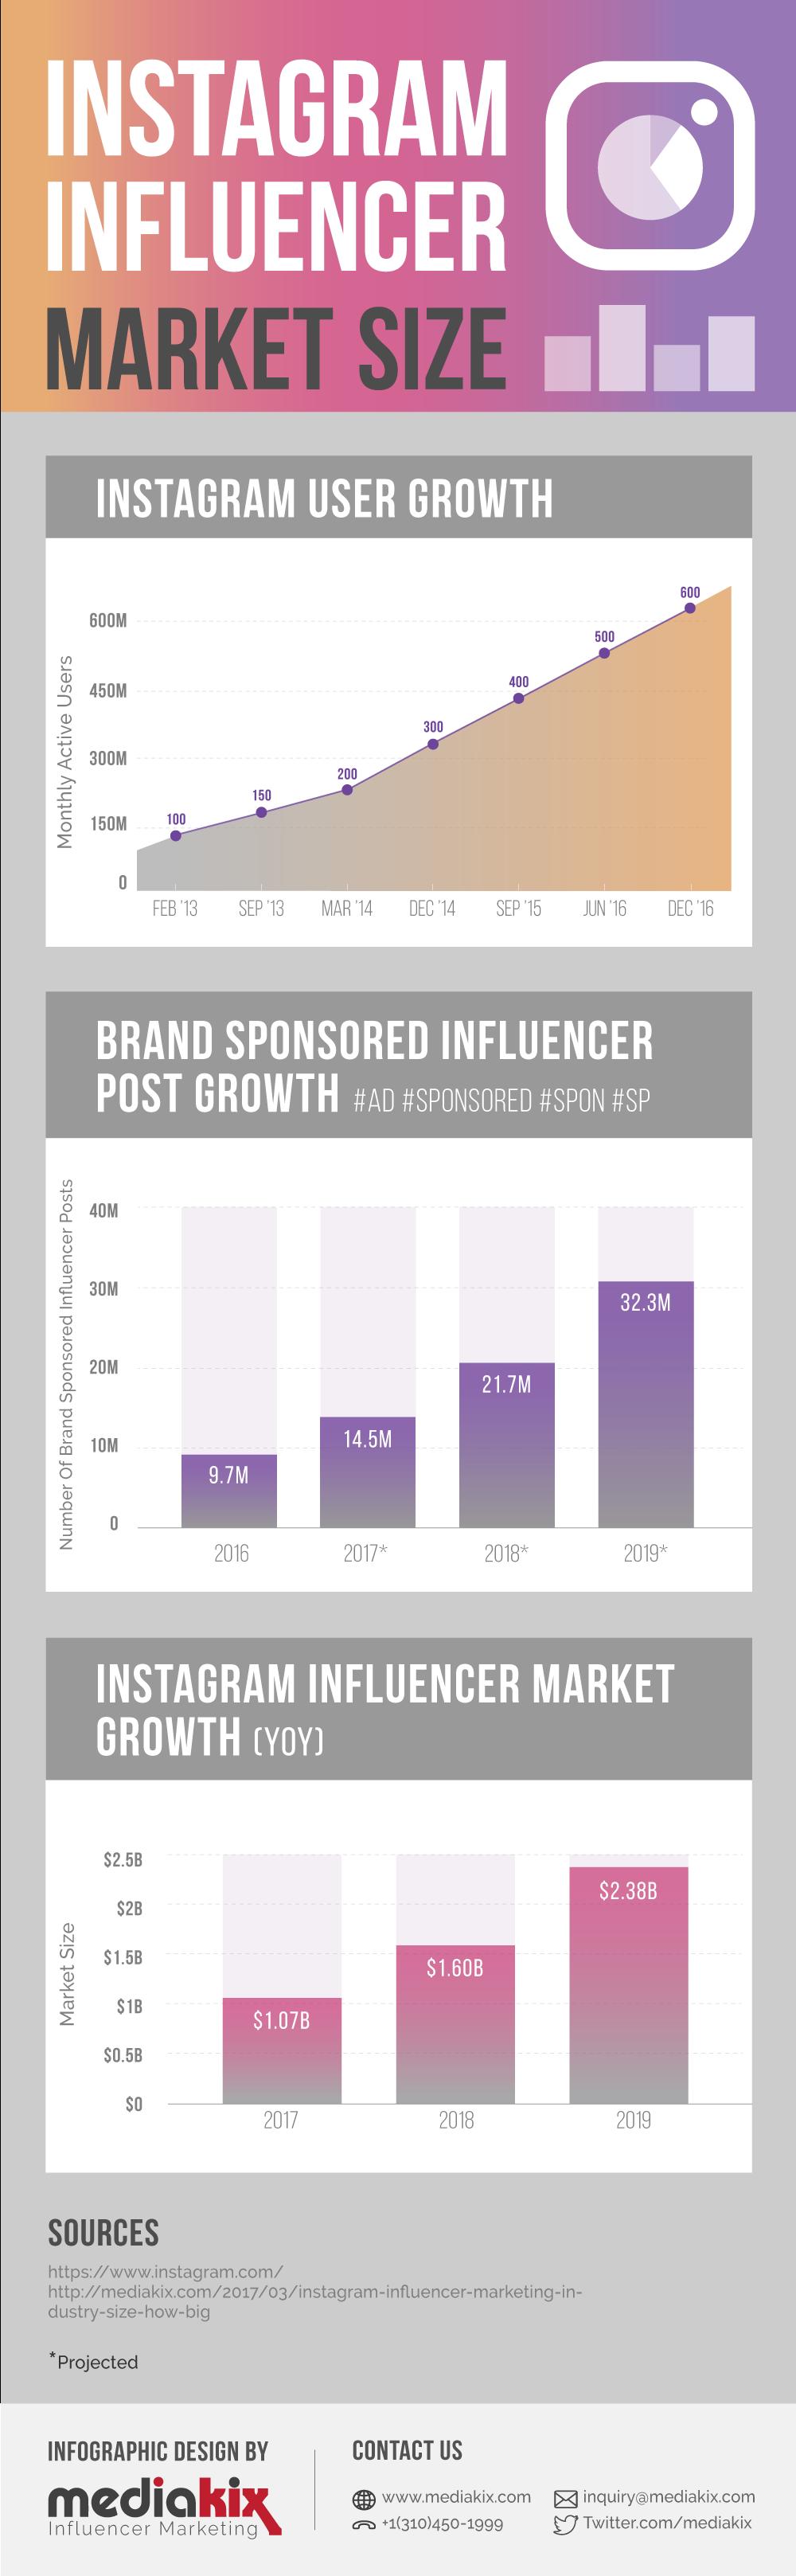 Instagram Influencer Marketing Infographic